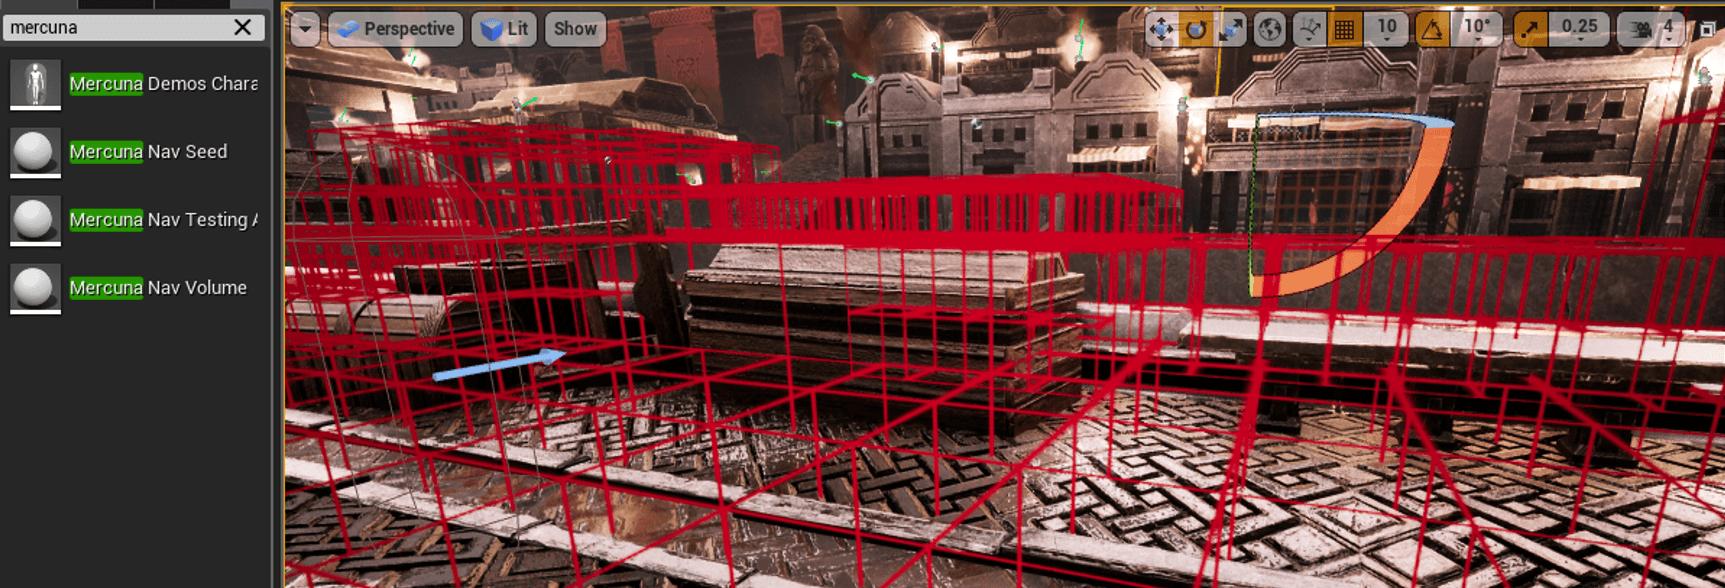 Unreal Engine 4 Integration | 3D Navigation | Mercuna